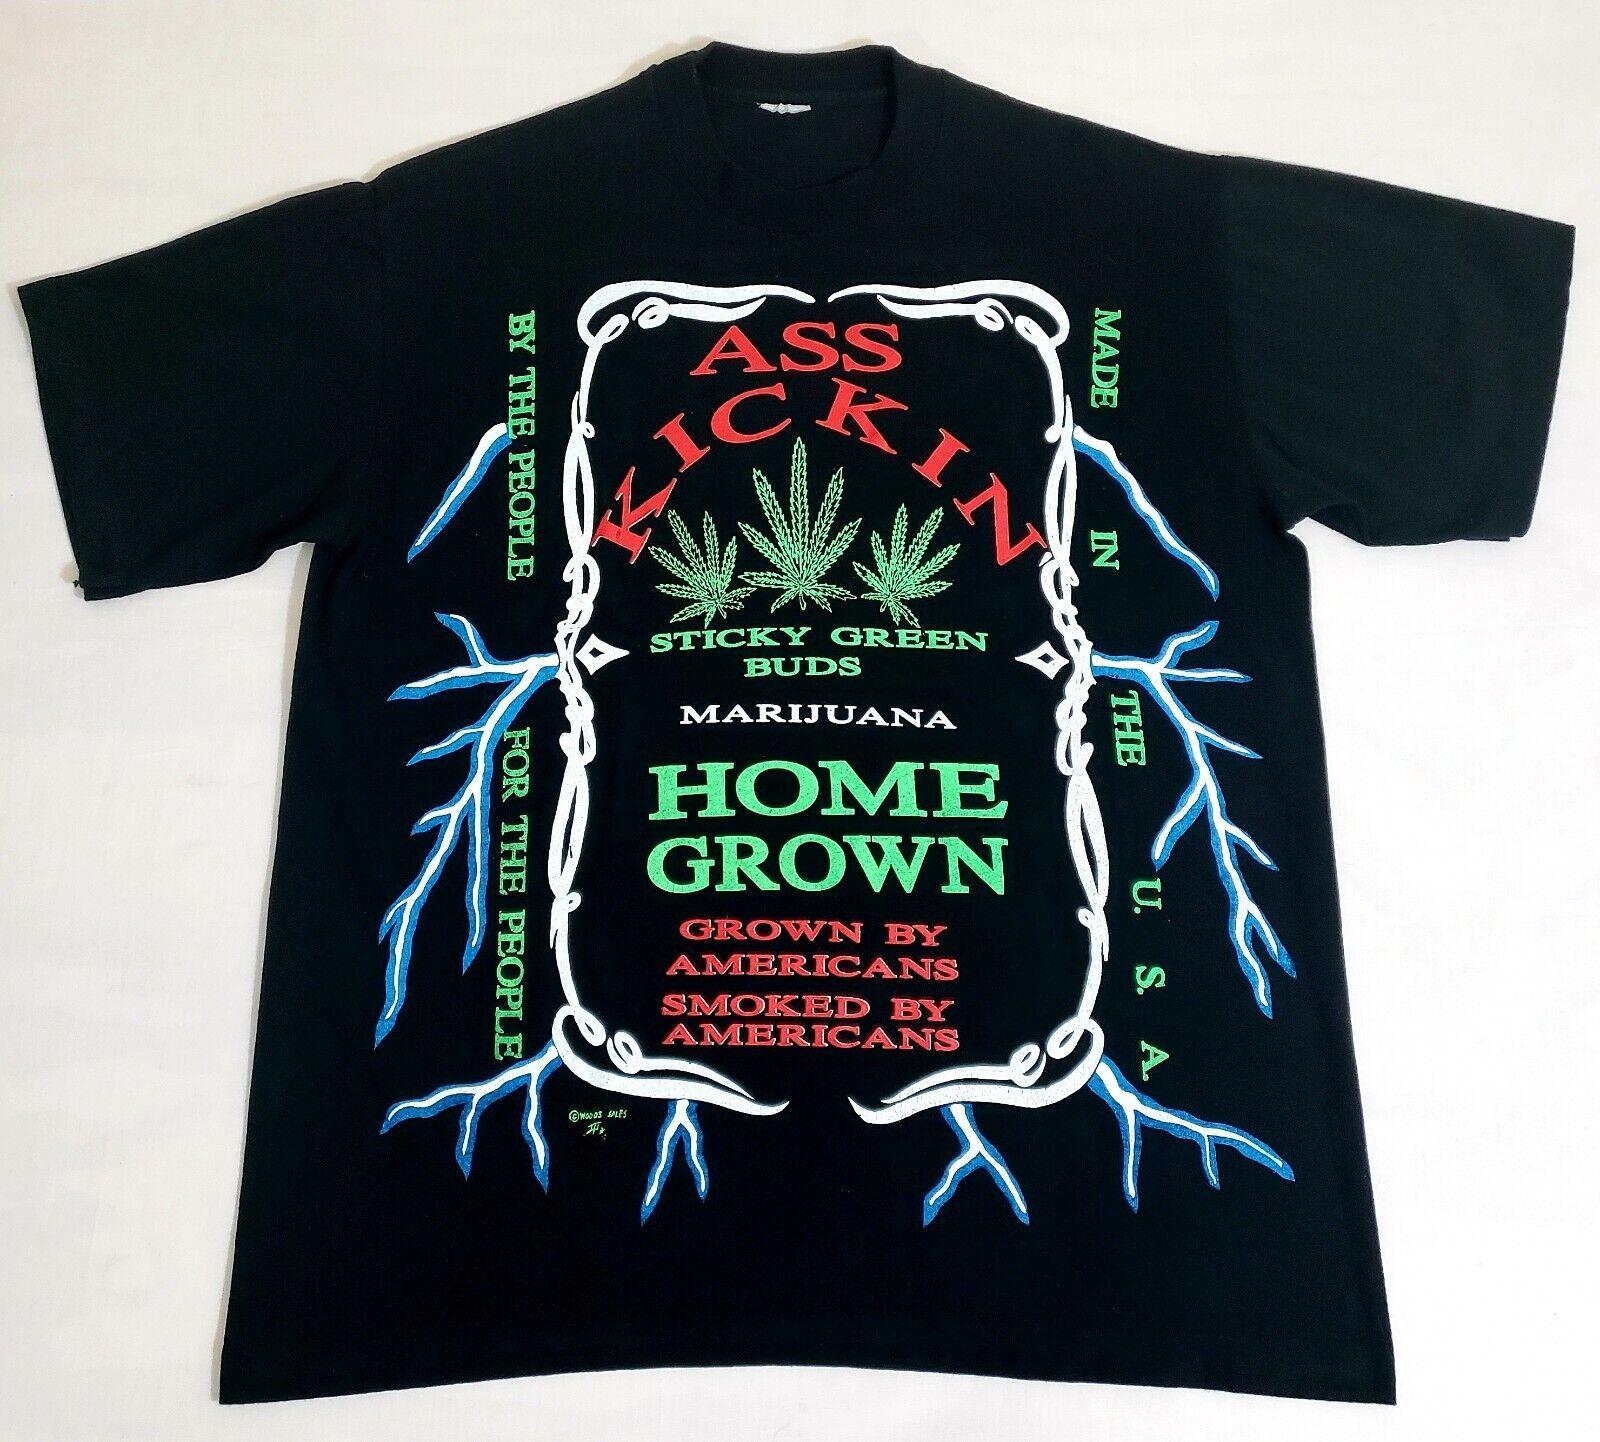 Vintage 90s MARIJUANA Ass Kickin Home Grown T-hemd Sz groß Weed Dope Rap Tee